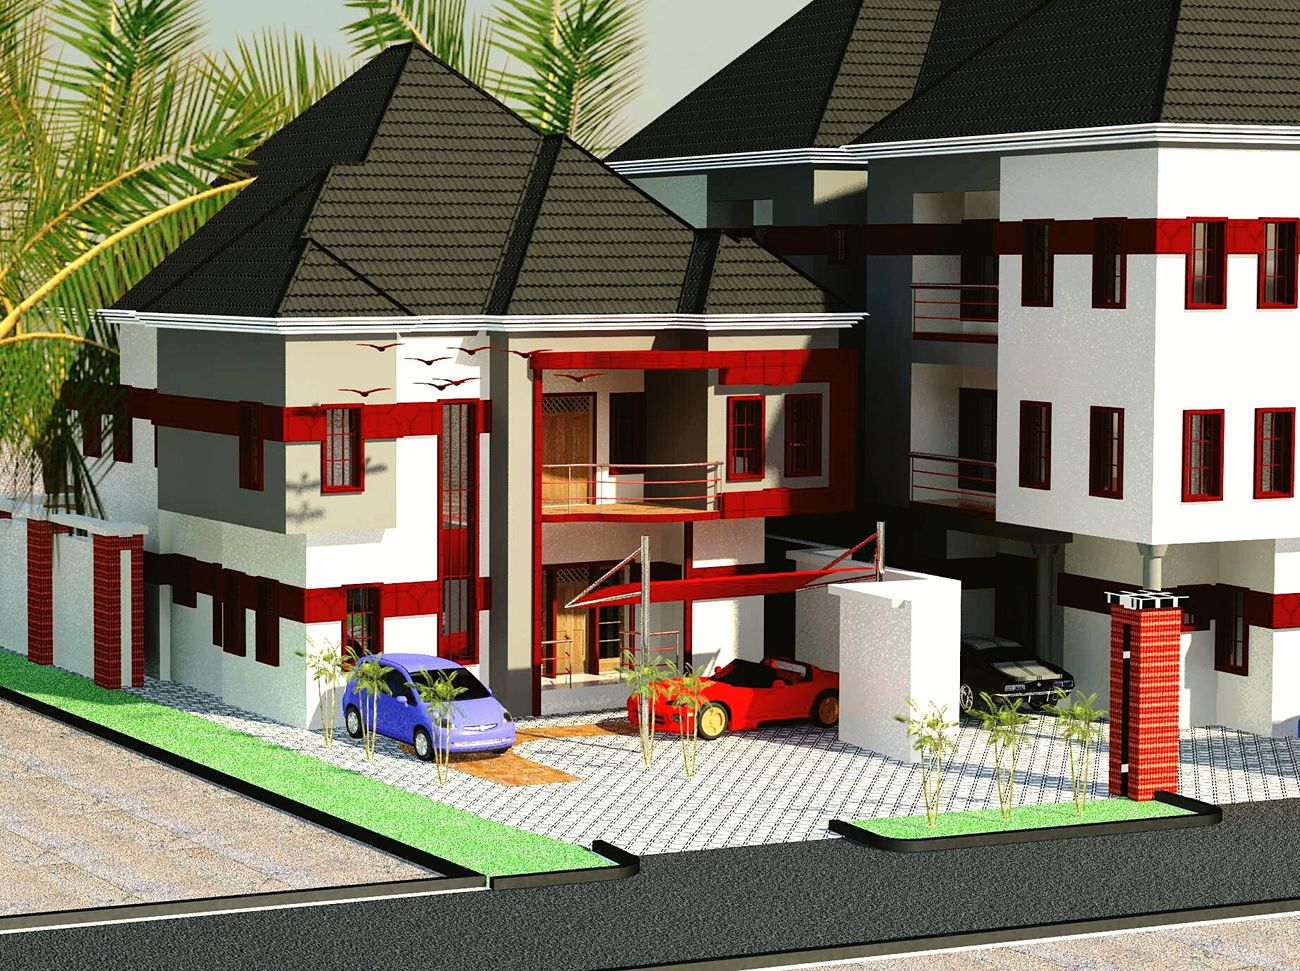 My latest Revit Architecture 2014 design